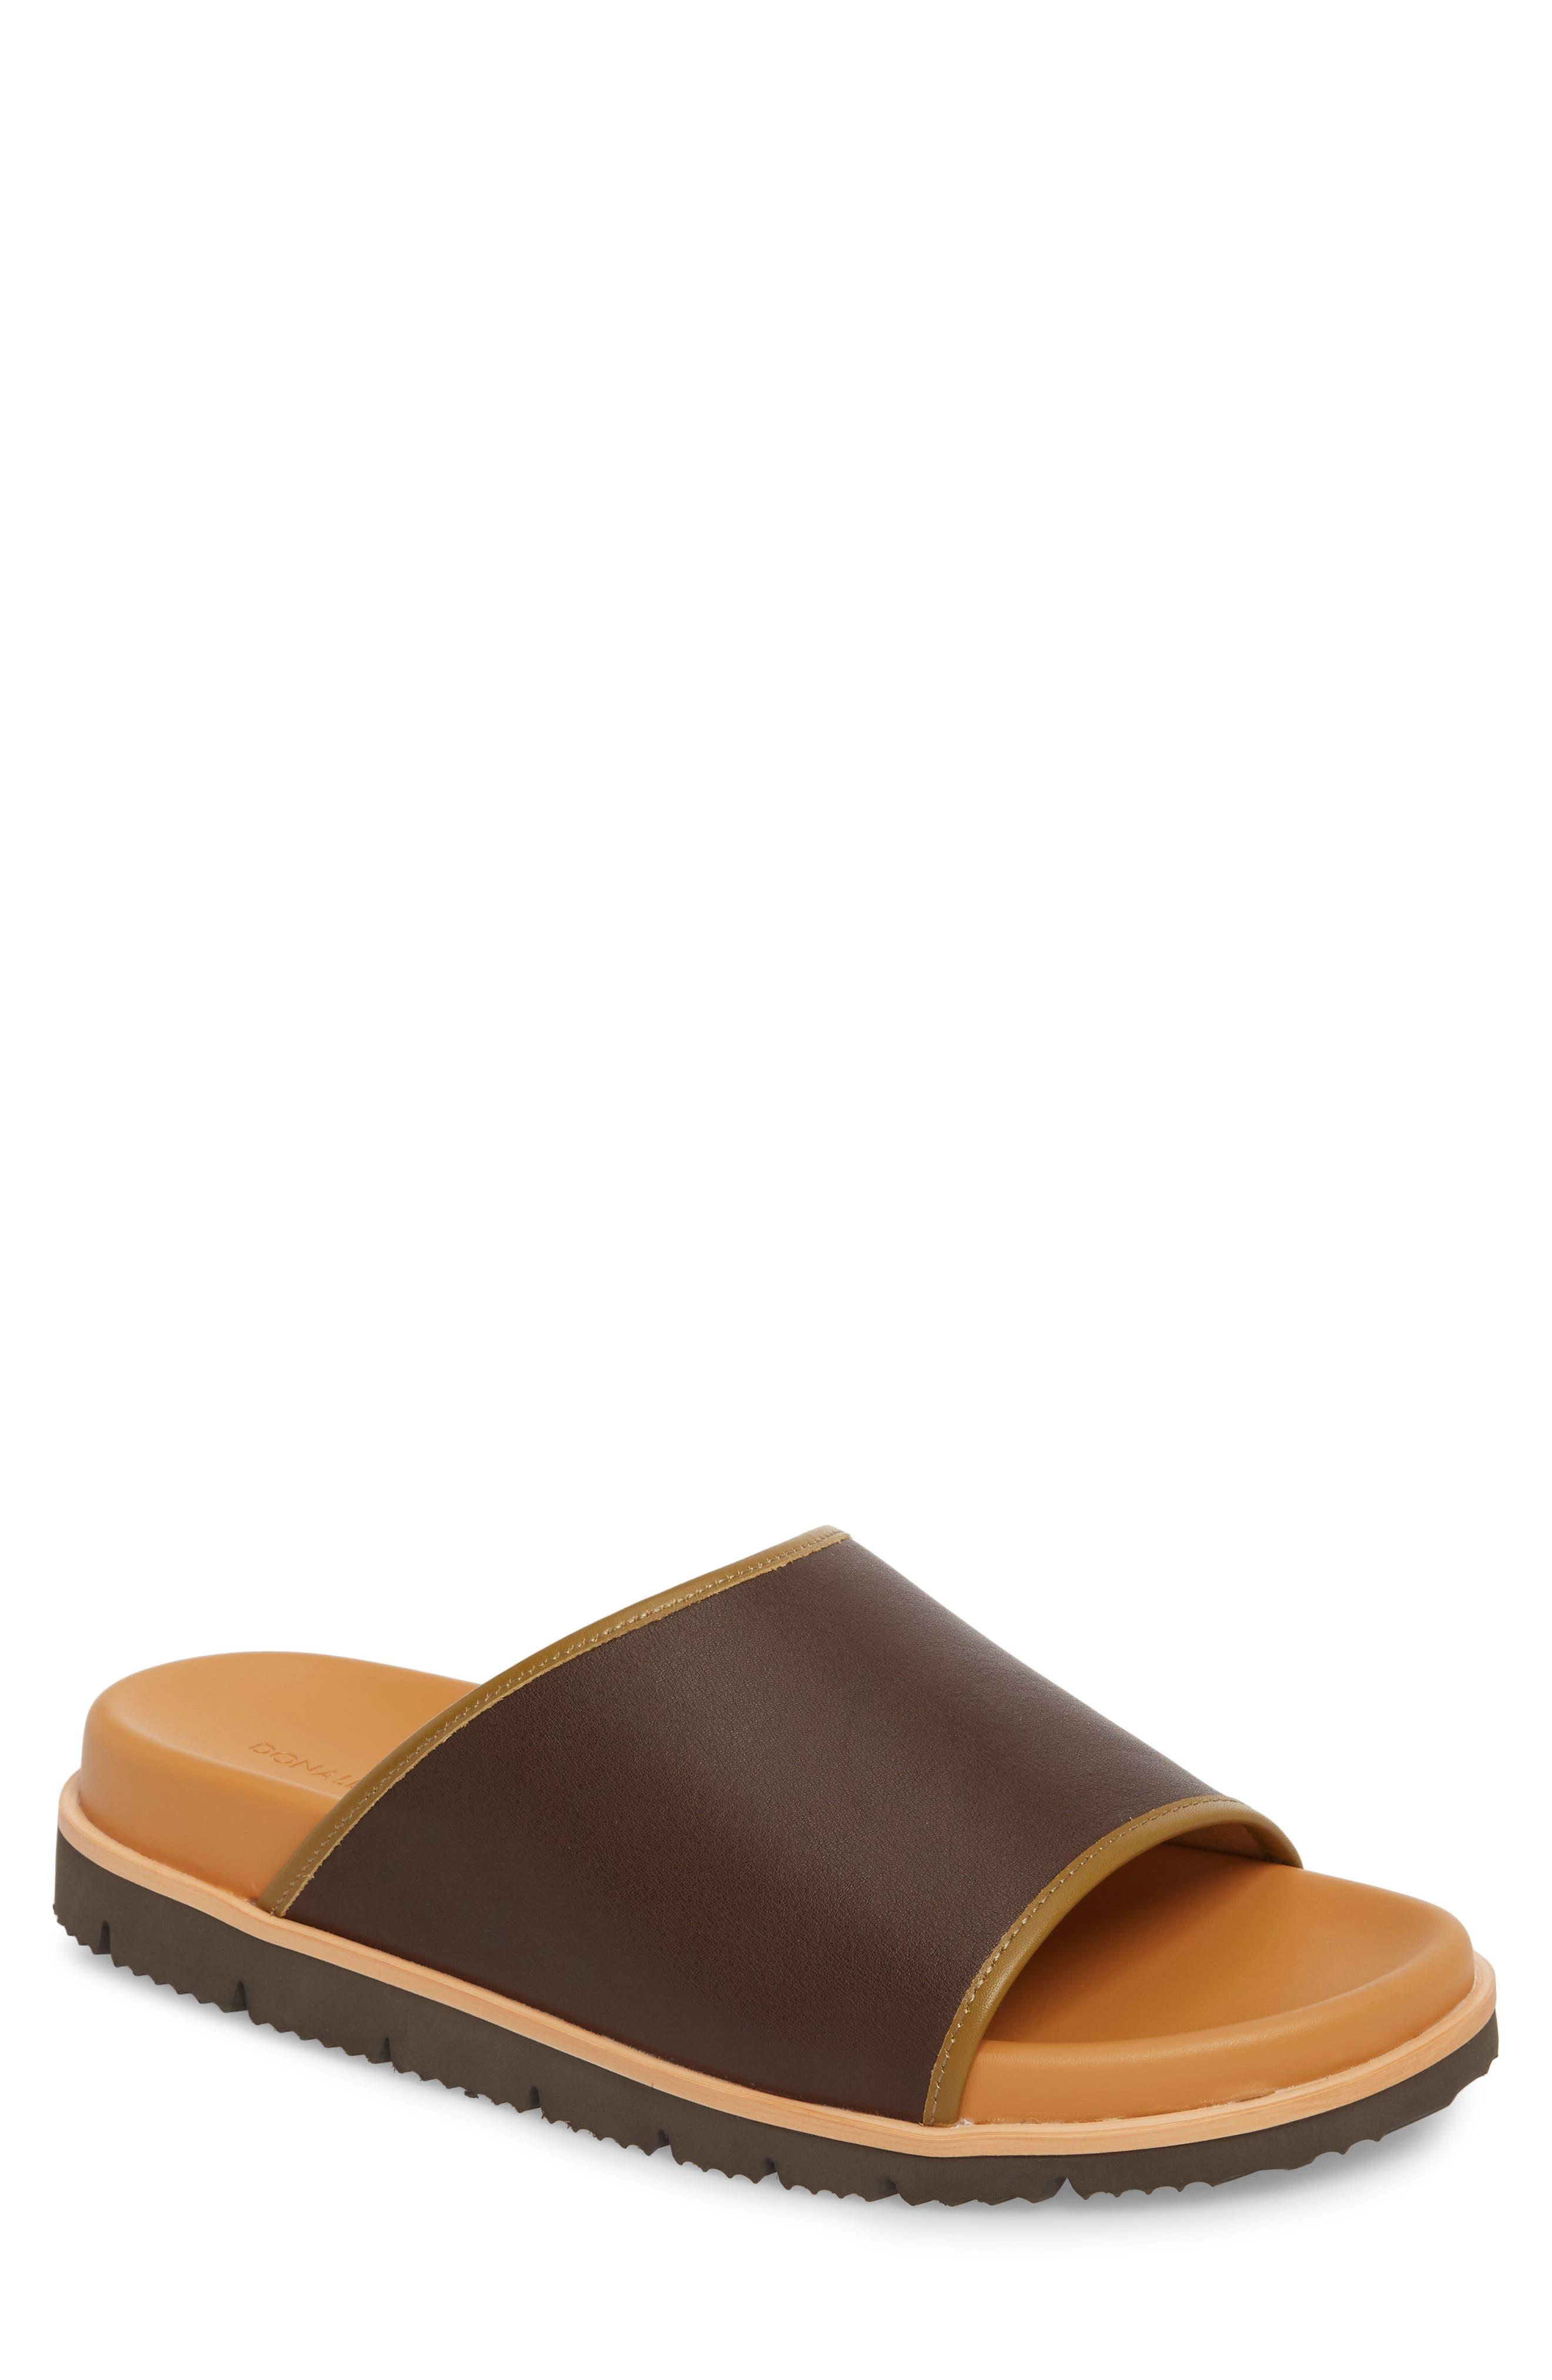 Brody Slide Sandal,                         Main,                         color, 200